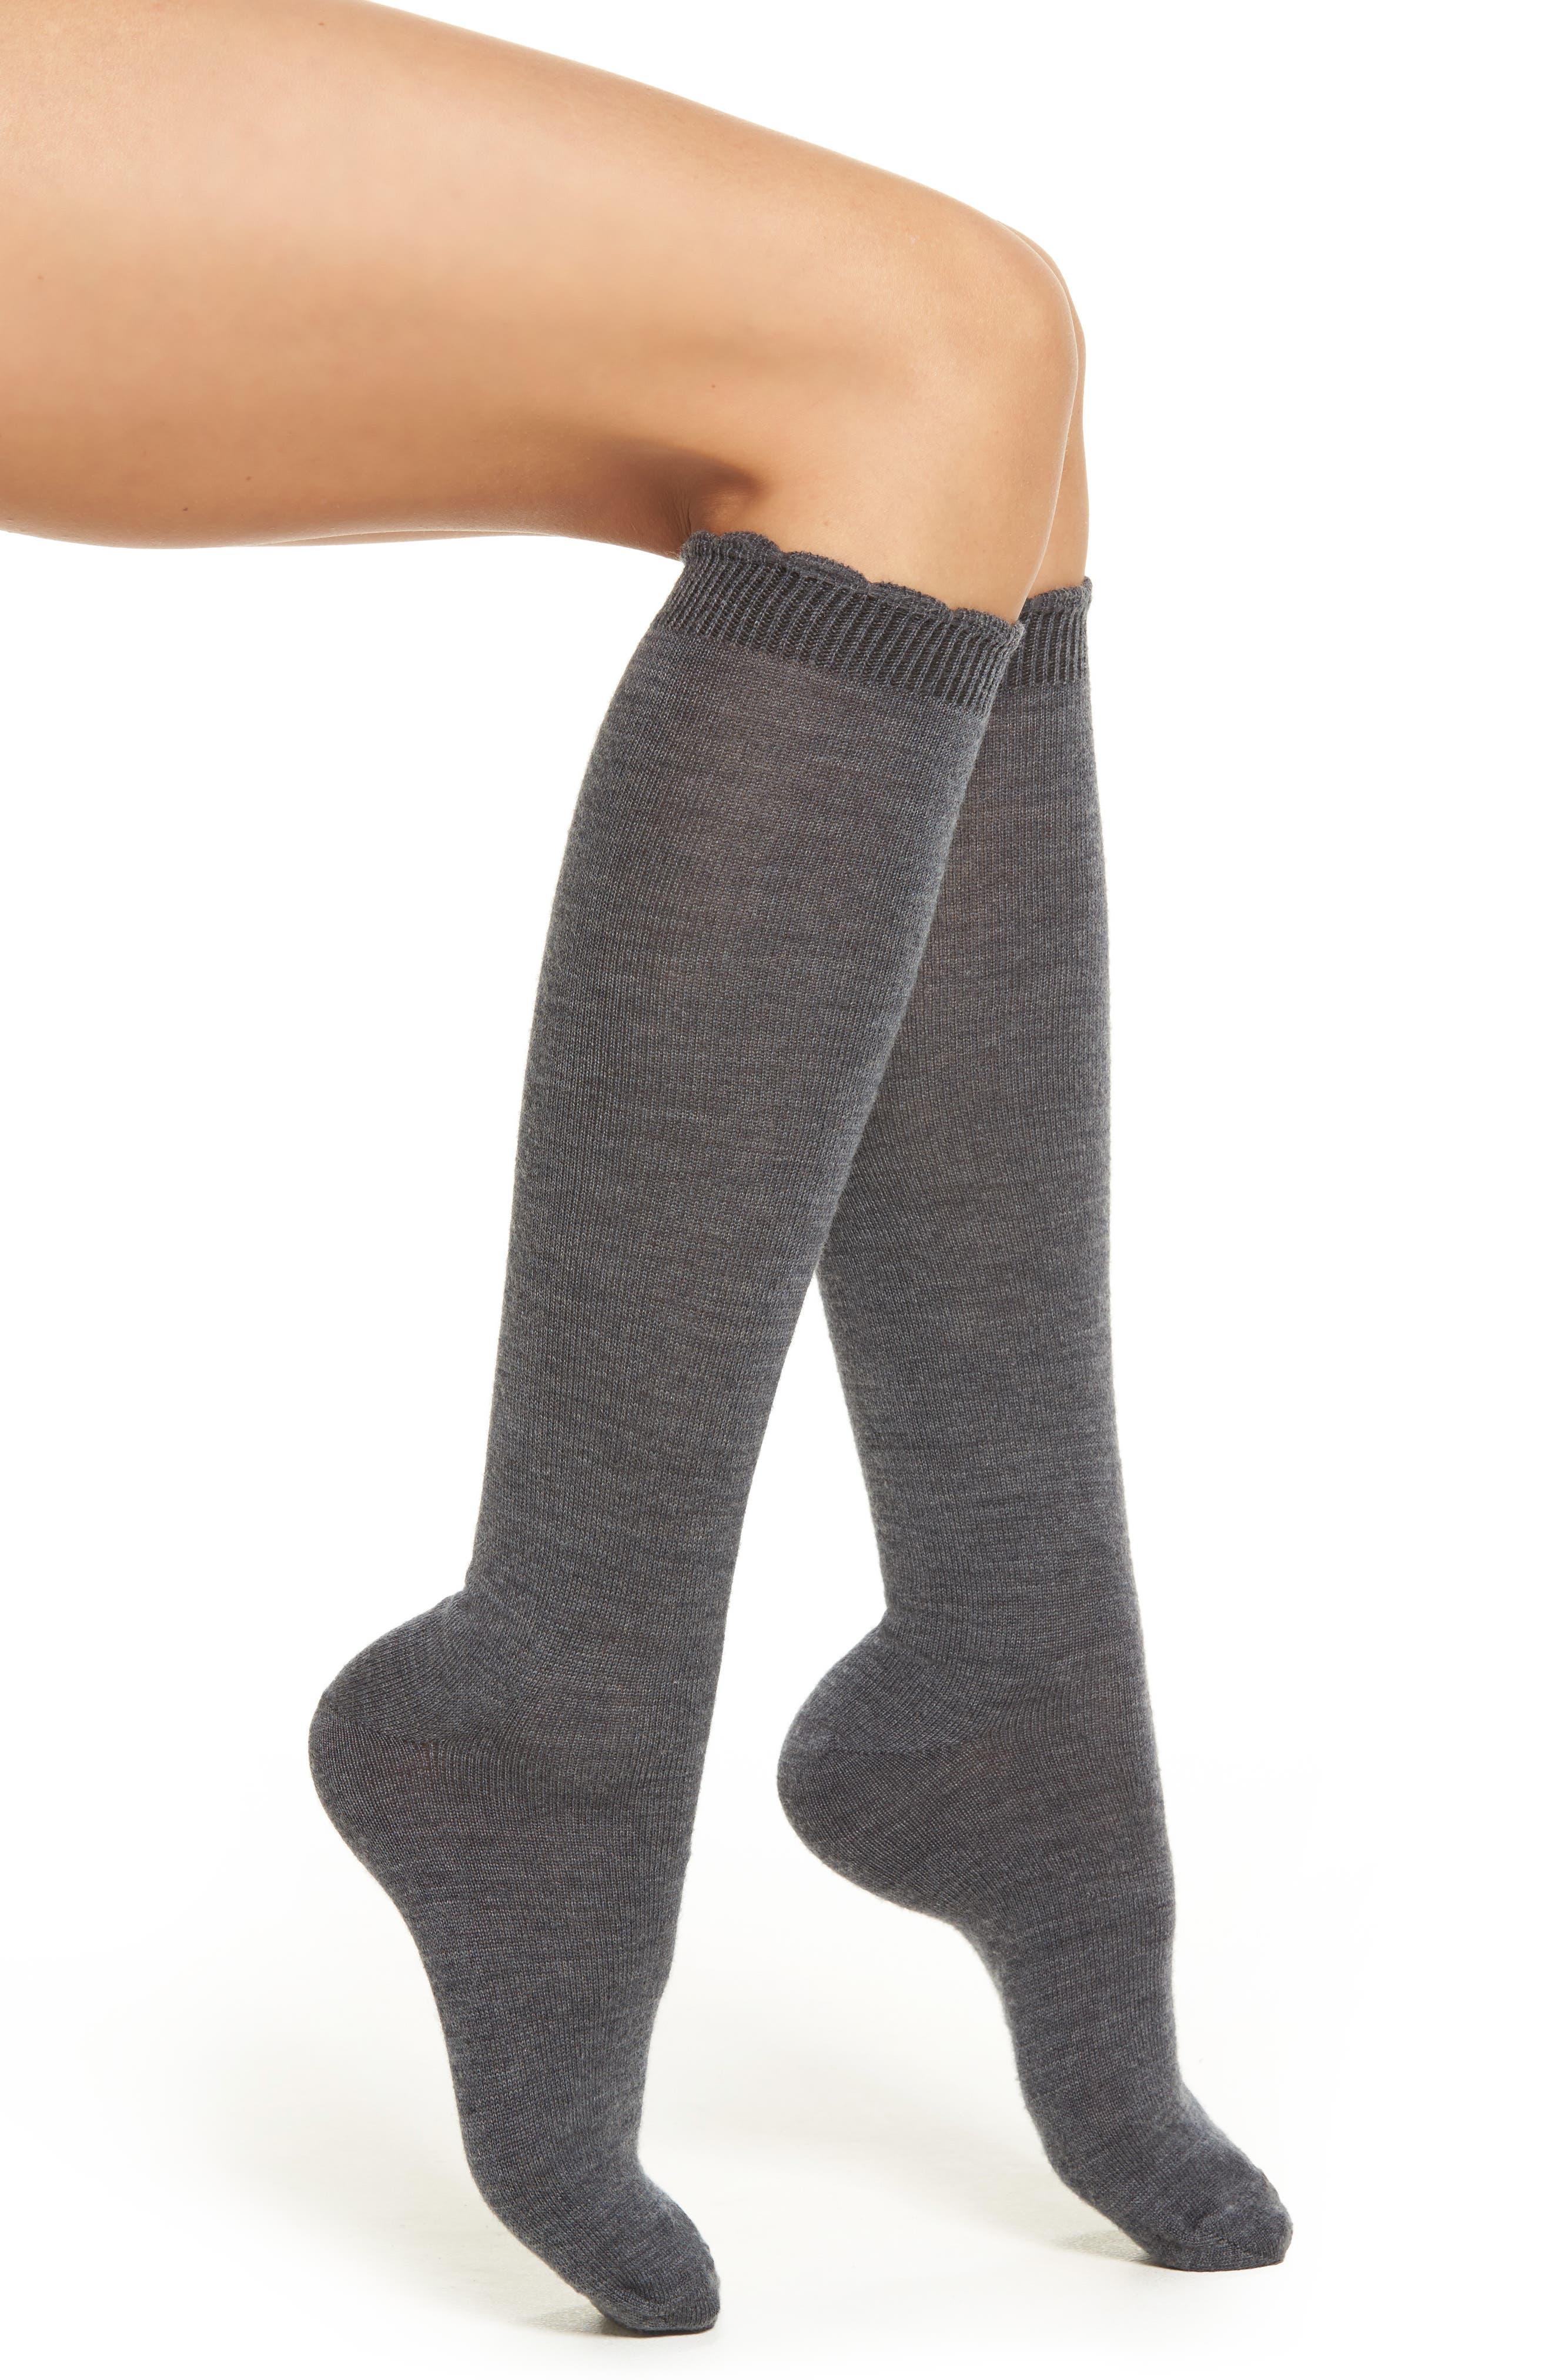 Merino Wool Blend Knee Socks,                             Main thumbnail 1, color,                             098